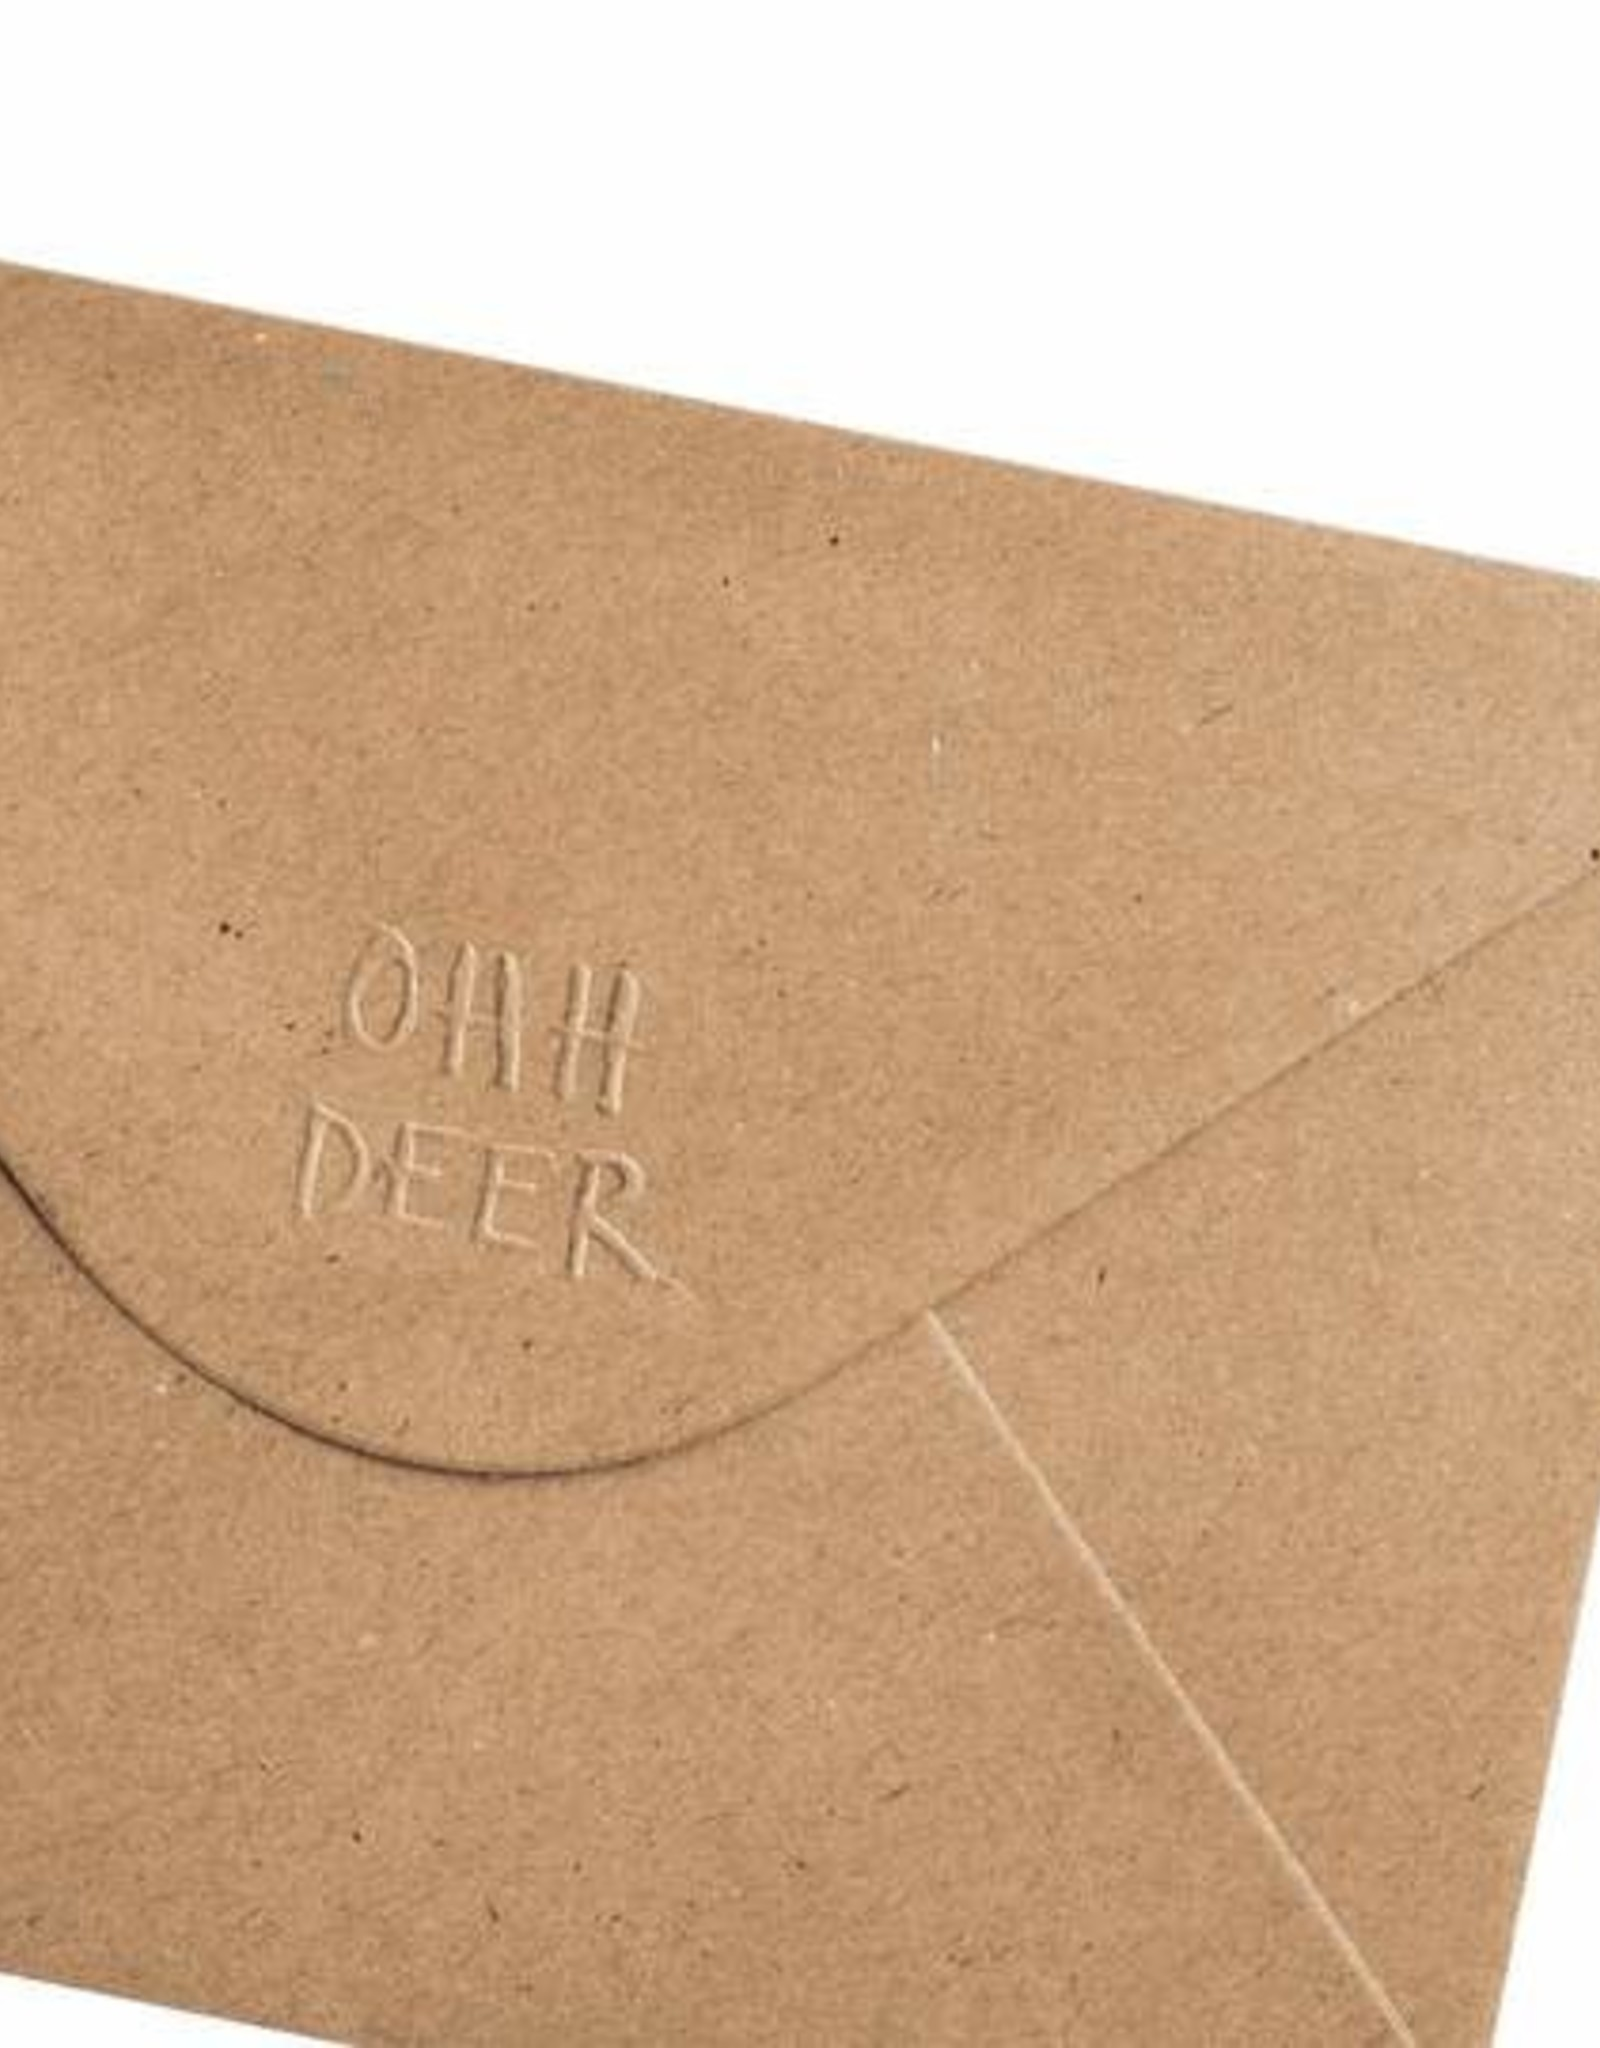 Ohh Deer White Bison Greeting Card  - Ohh Deer